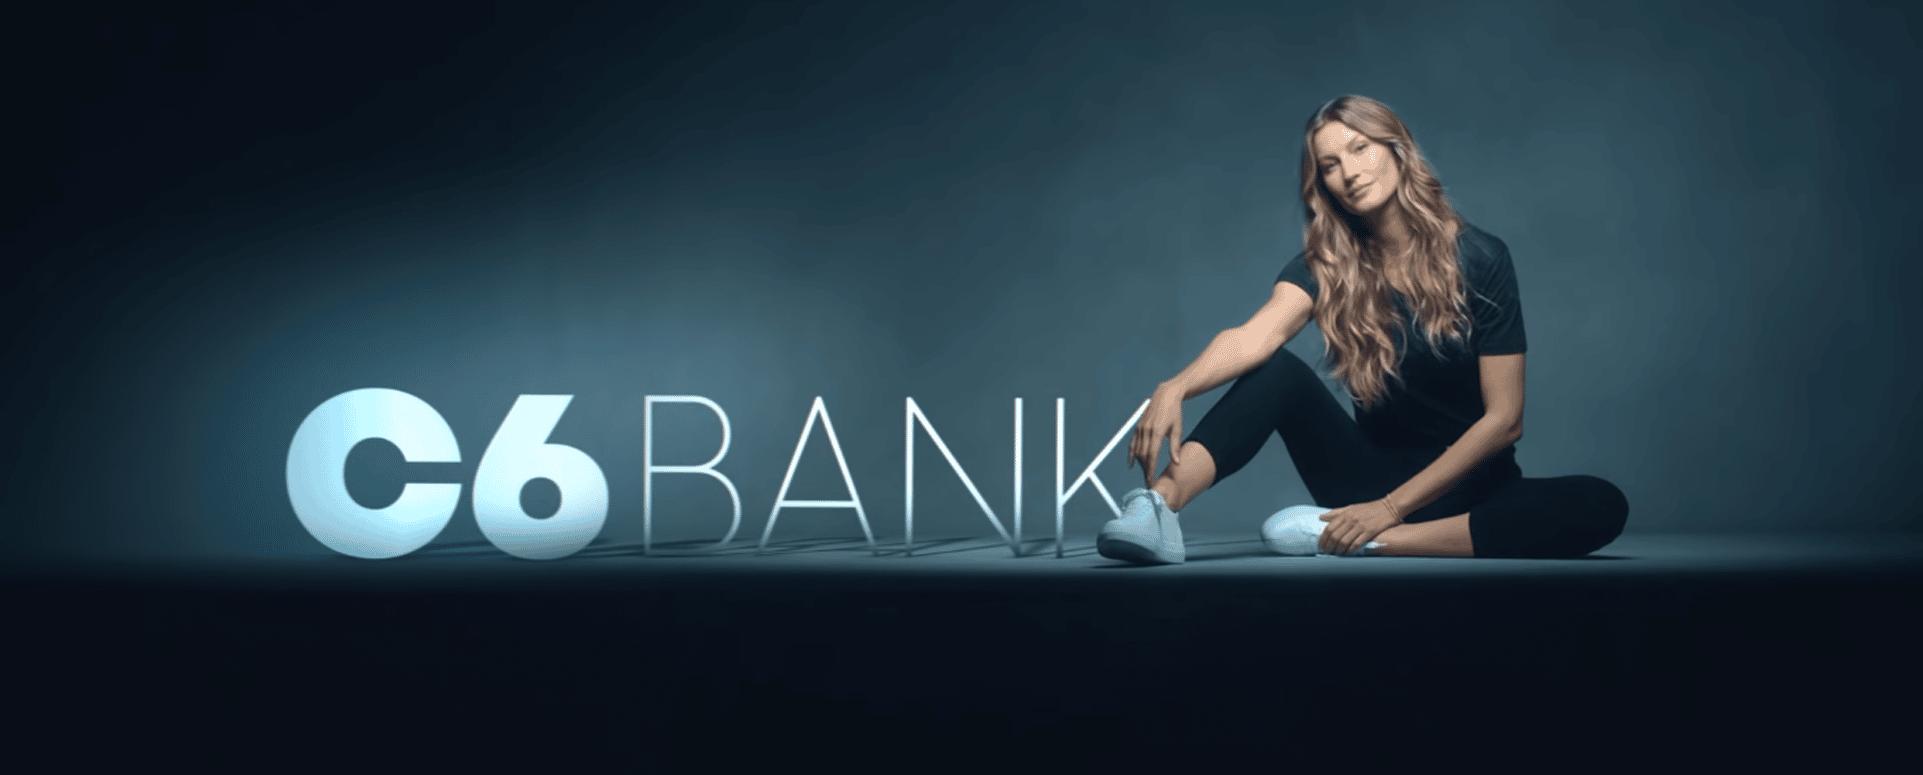 Gisele Bündchen c6 bank